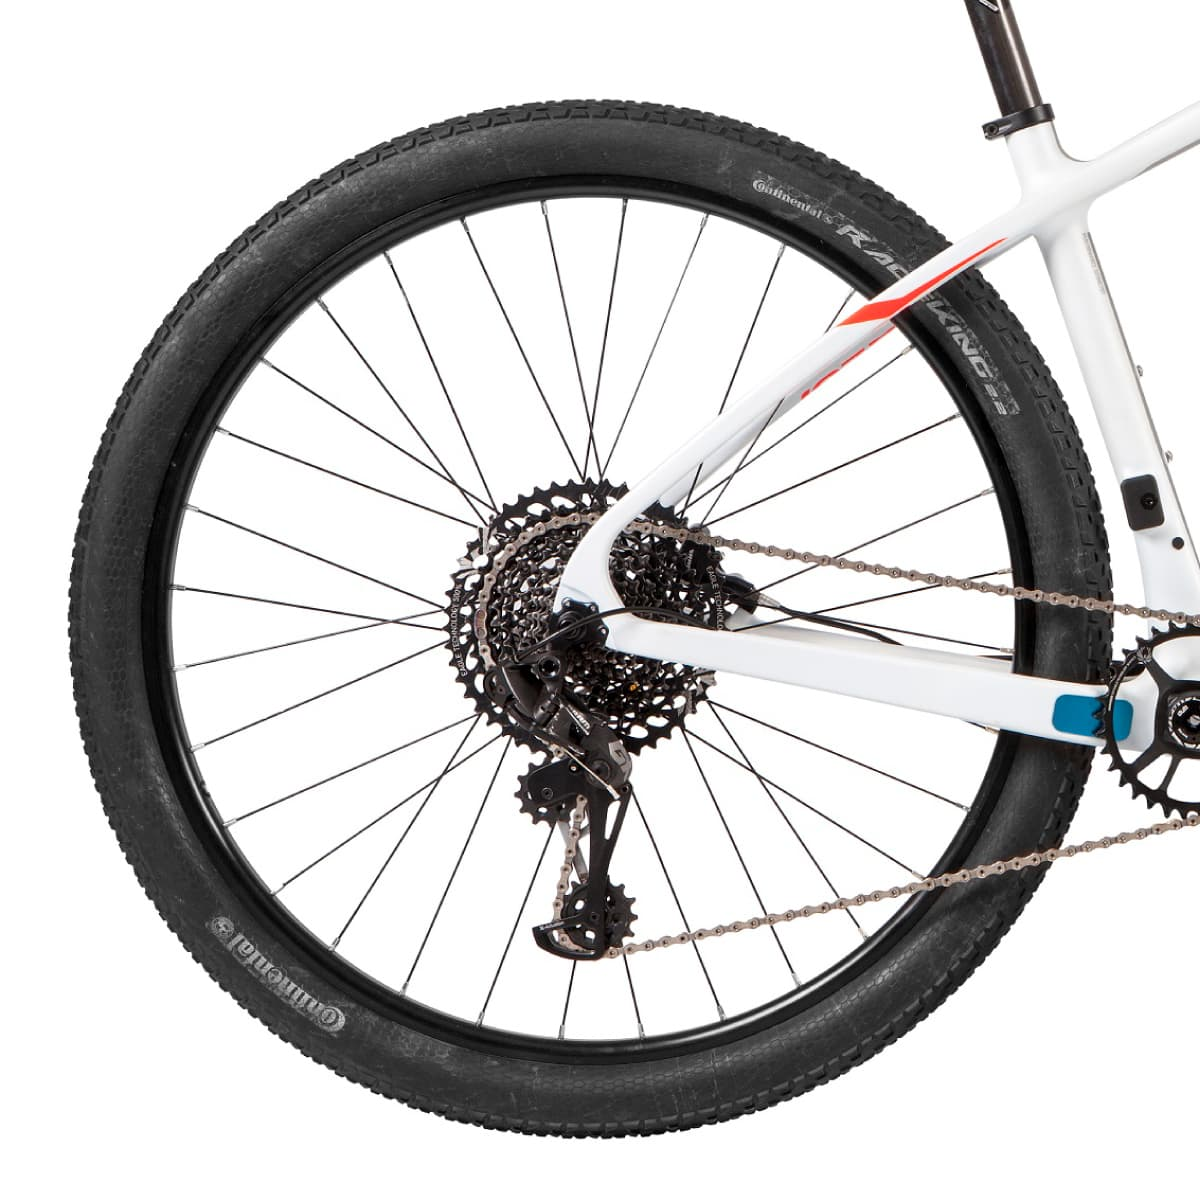 Bicicleta Caloi Elite Carbon Racing 2020 Sram 12v Aro 29